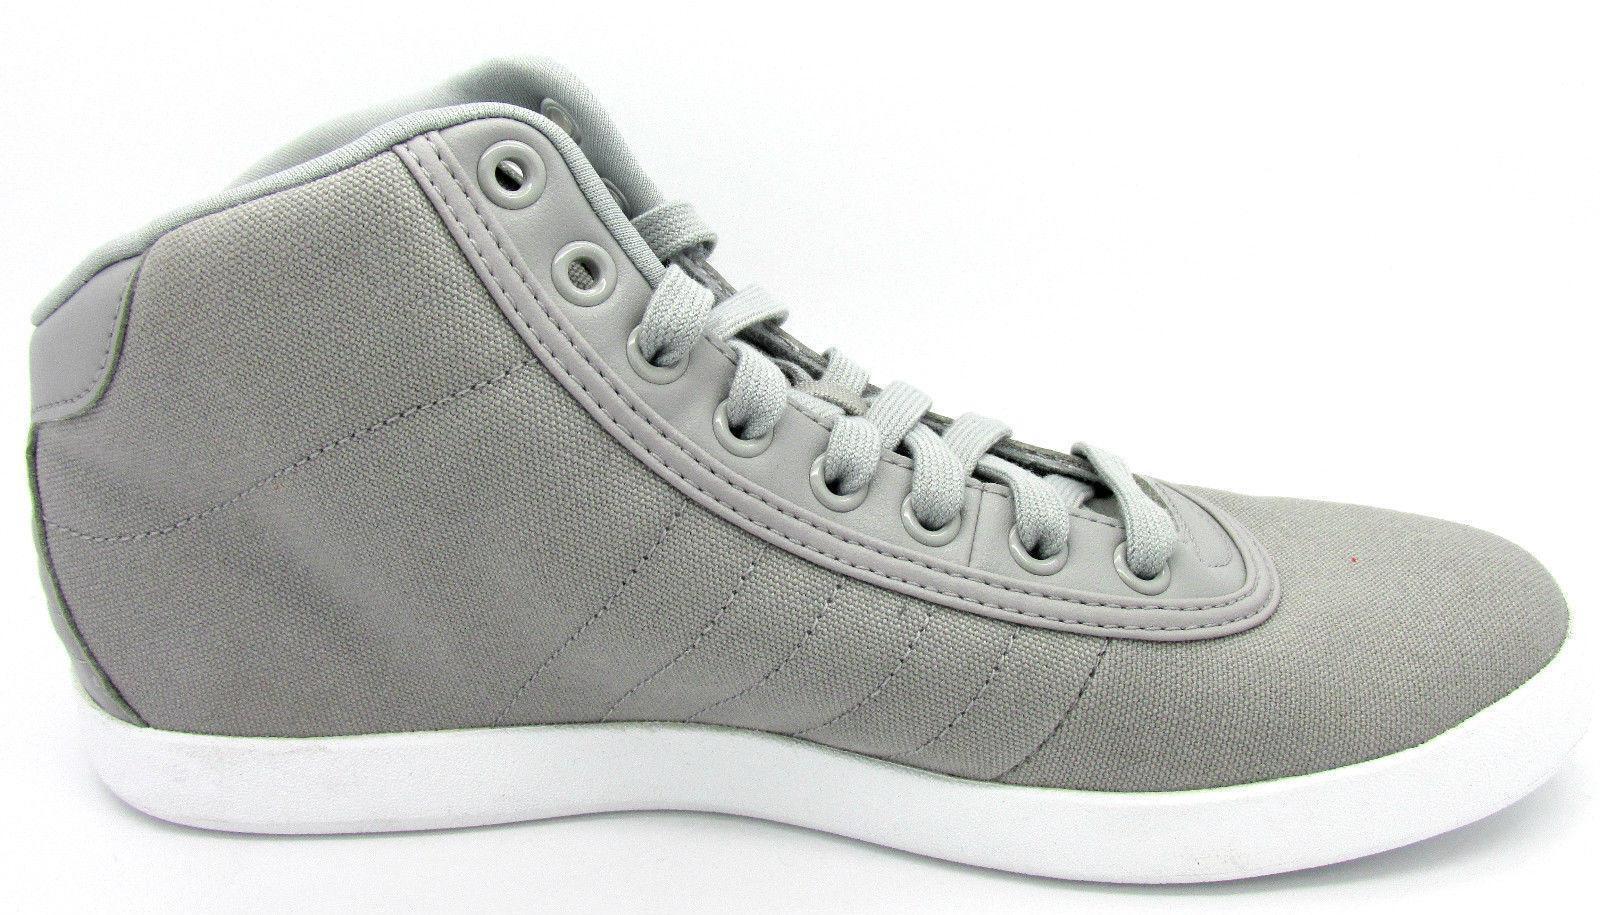 Damen Adidas Adi Hof Super Mitte mit Grau Turnschuhe g63955